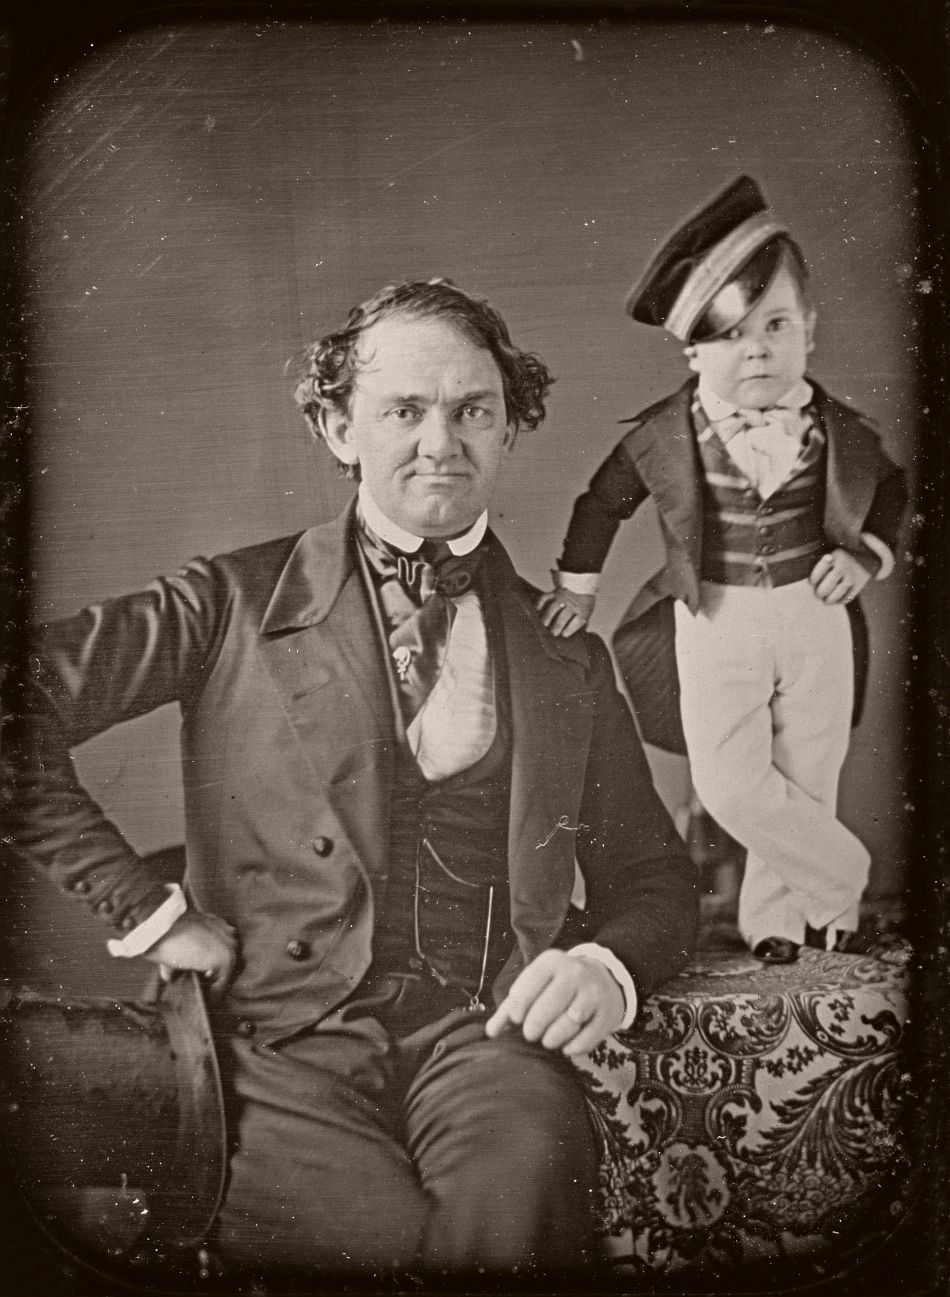 P.T. Barnum and General Tom Thumb, Half-plate daguerreotype, circa 1850.